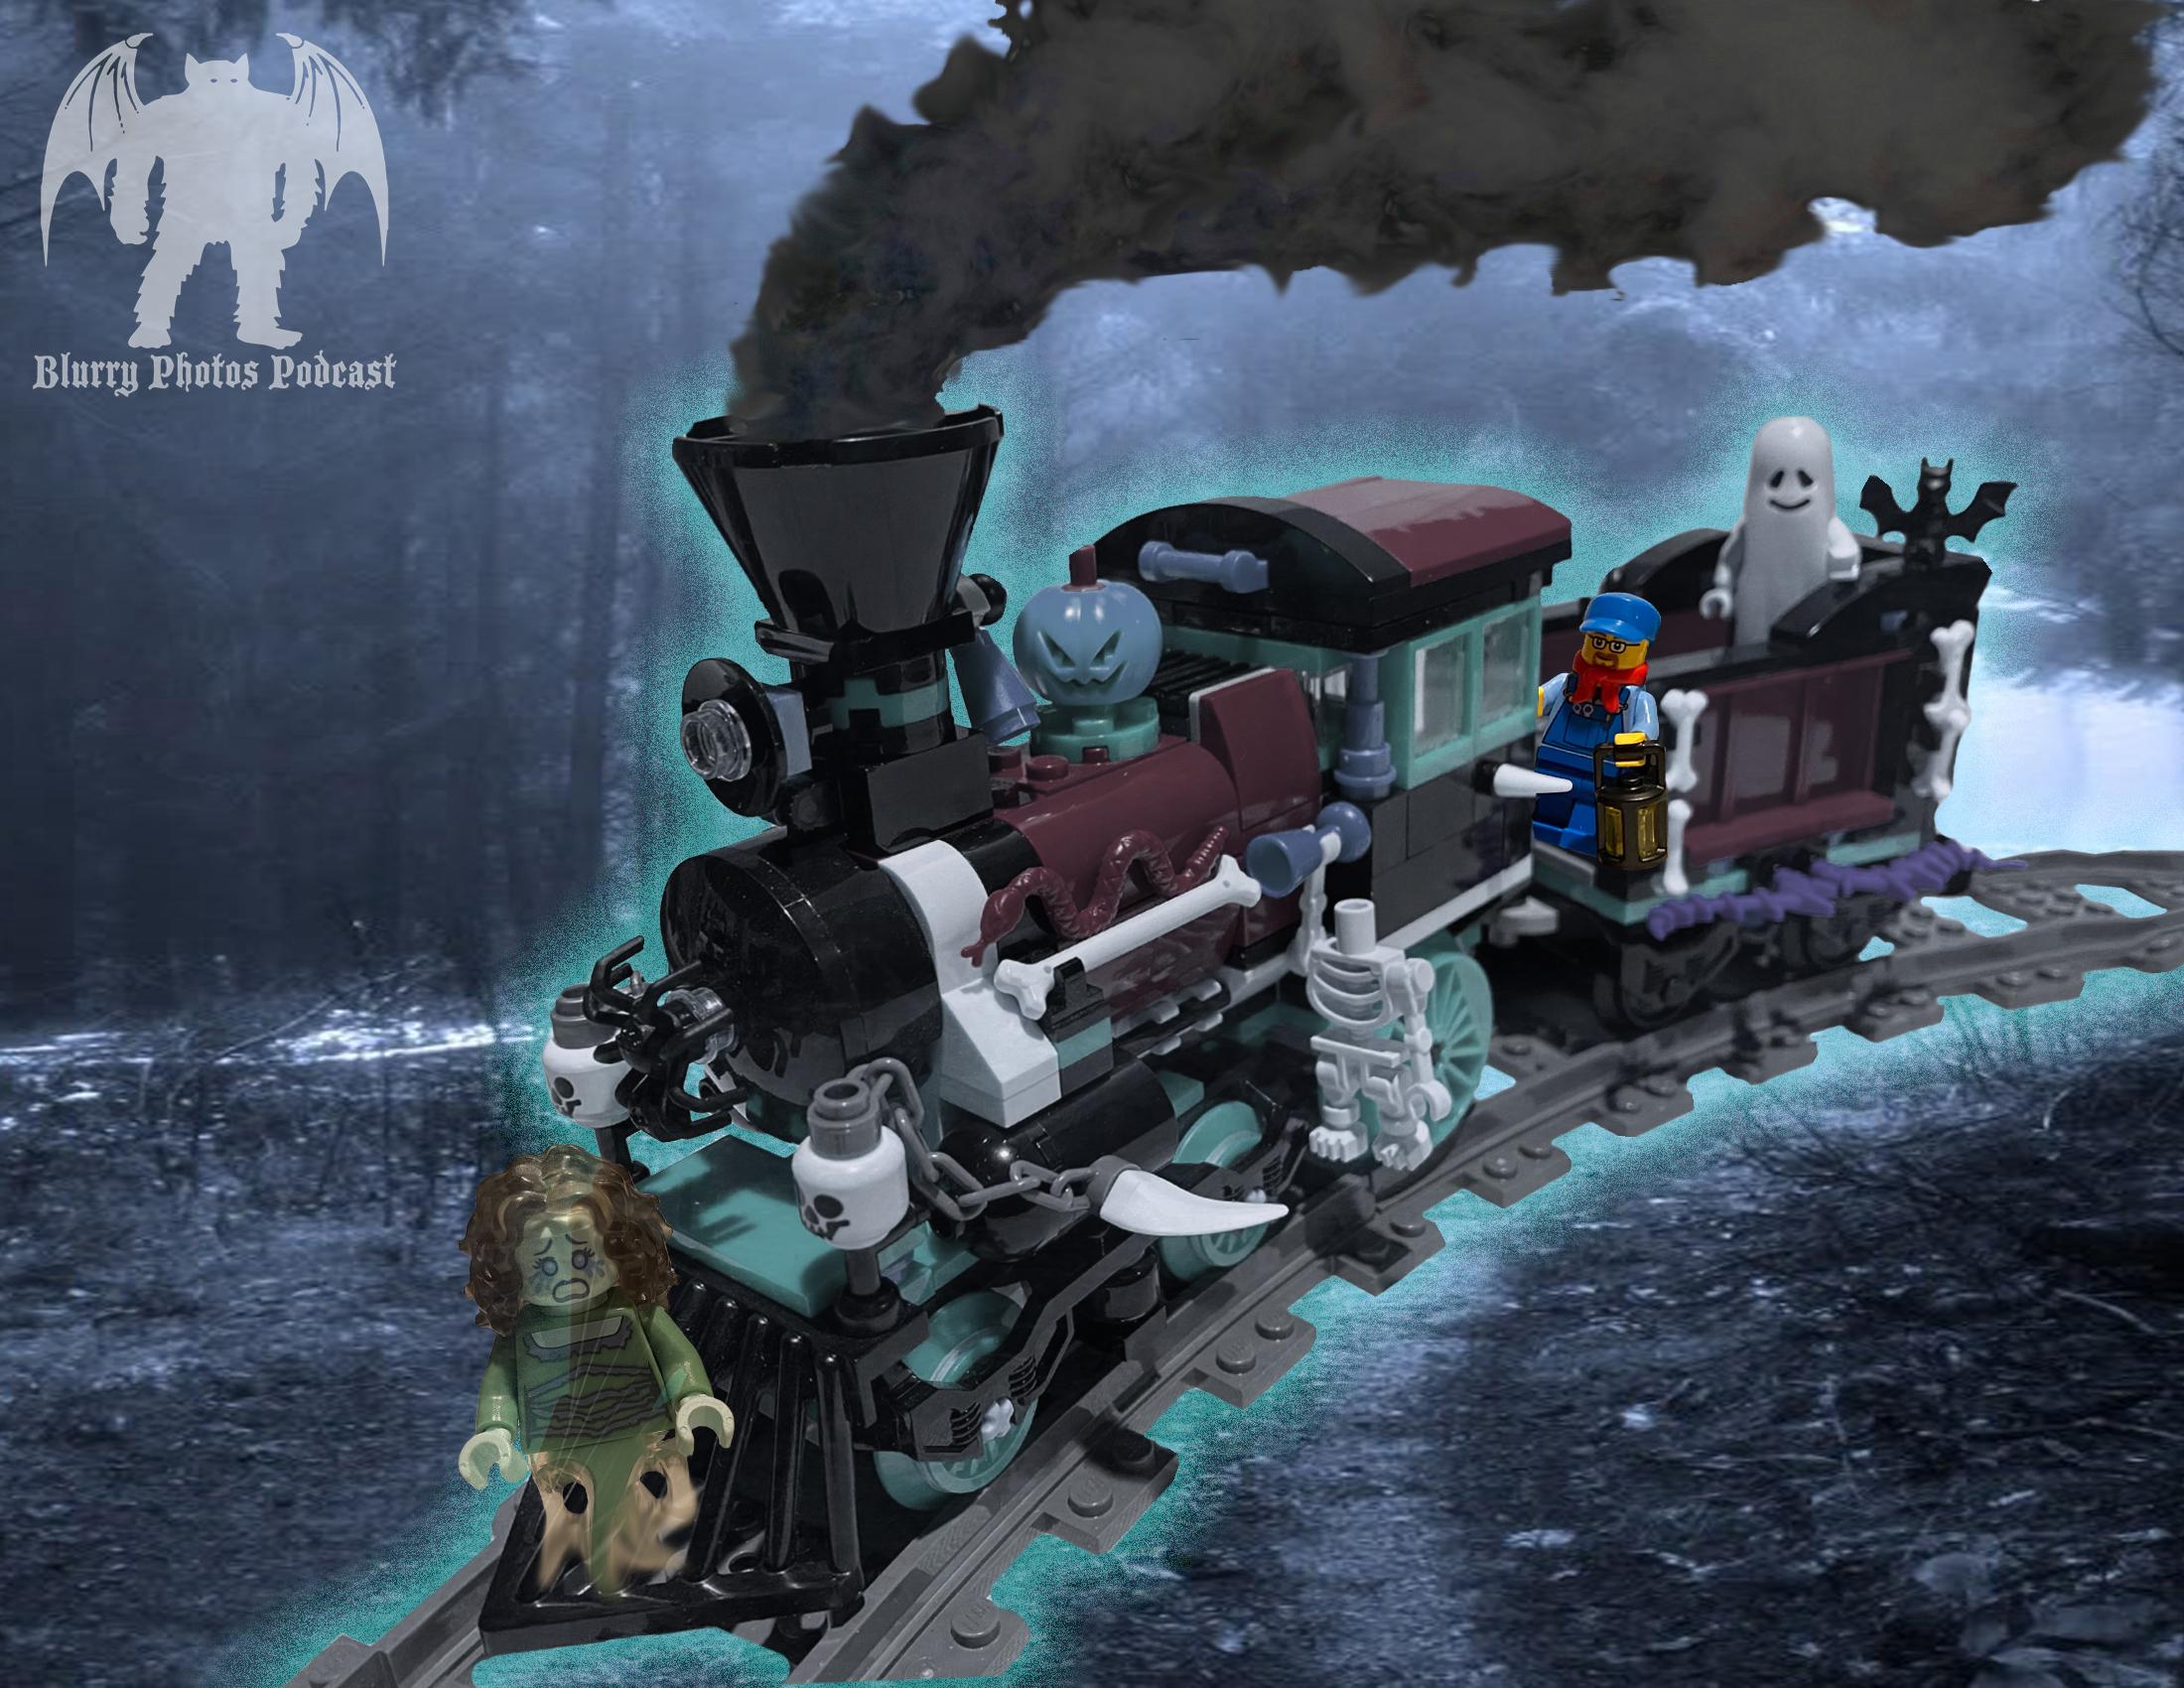 Railway Ghosts